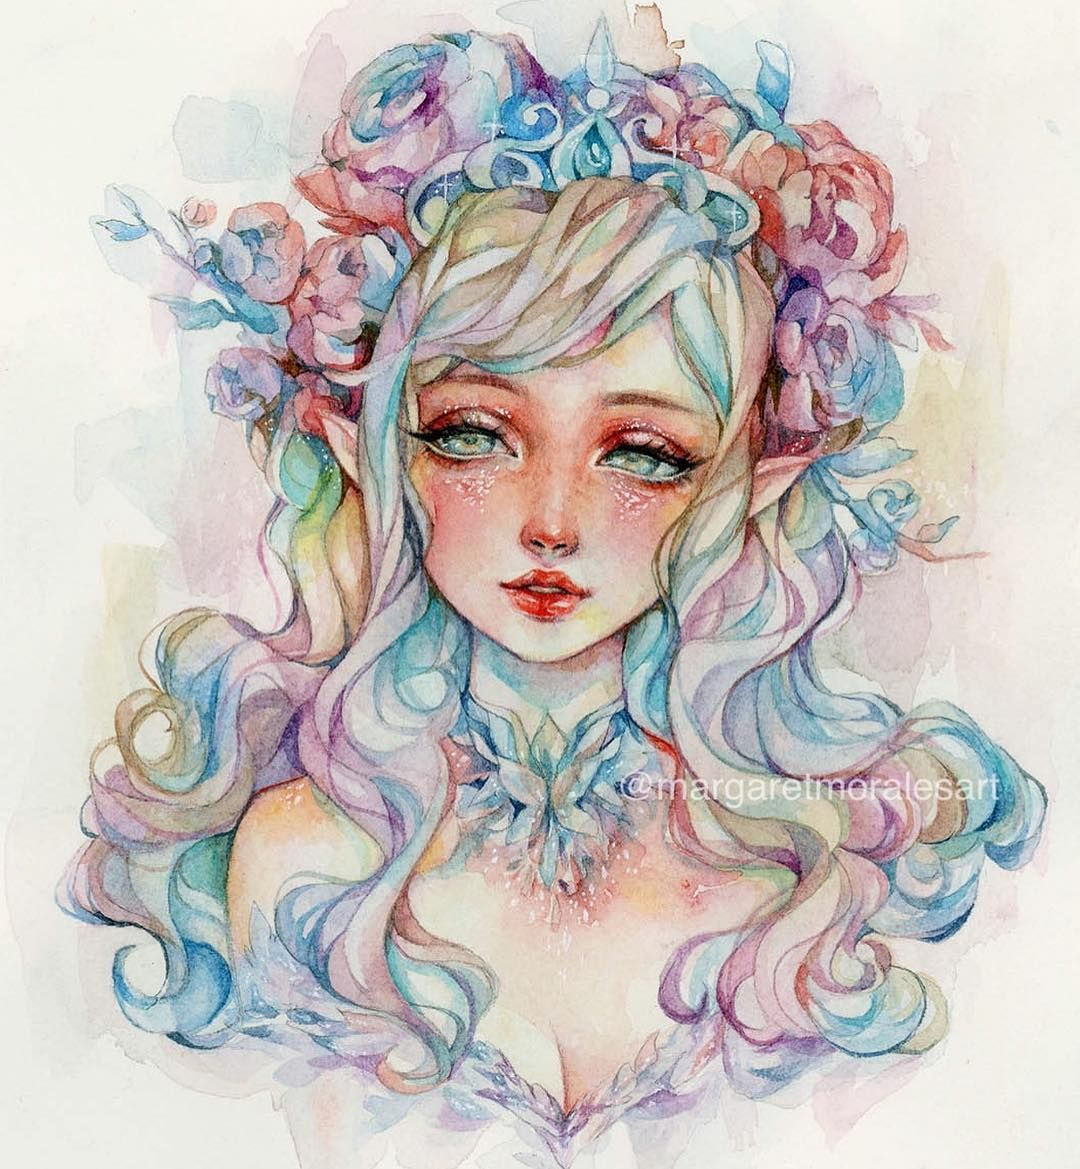 Watercolor Artist Margaret Morales Watercolor ARTWOONZ